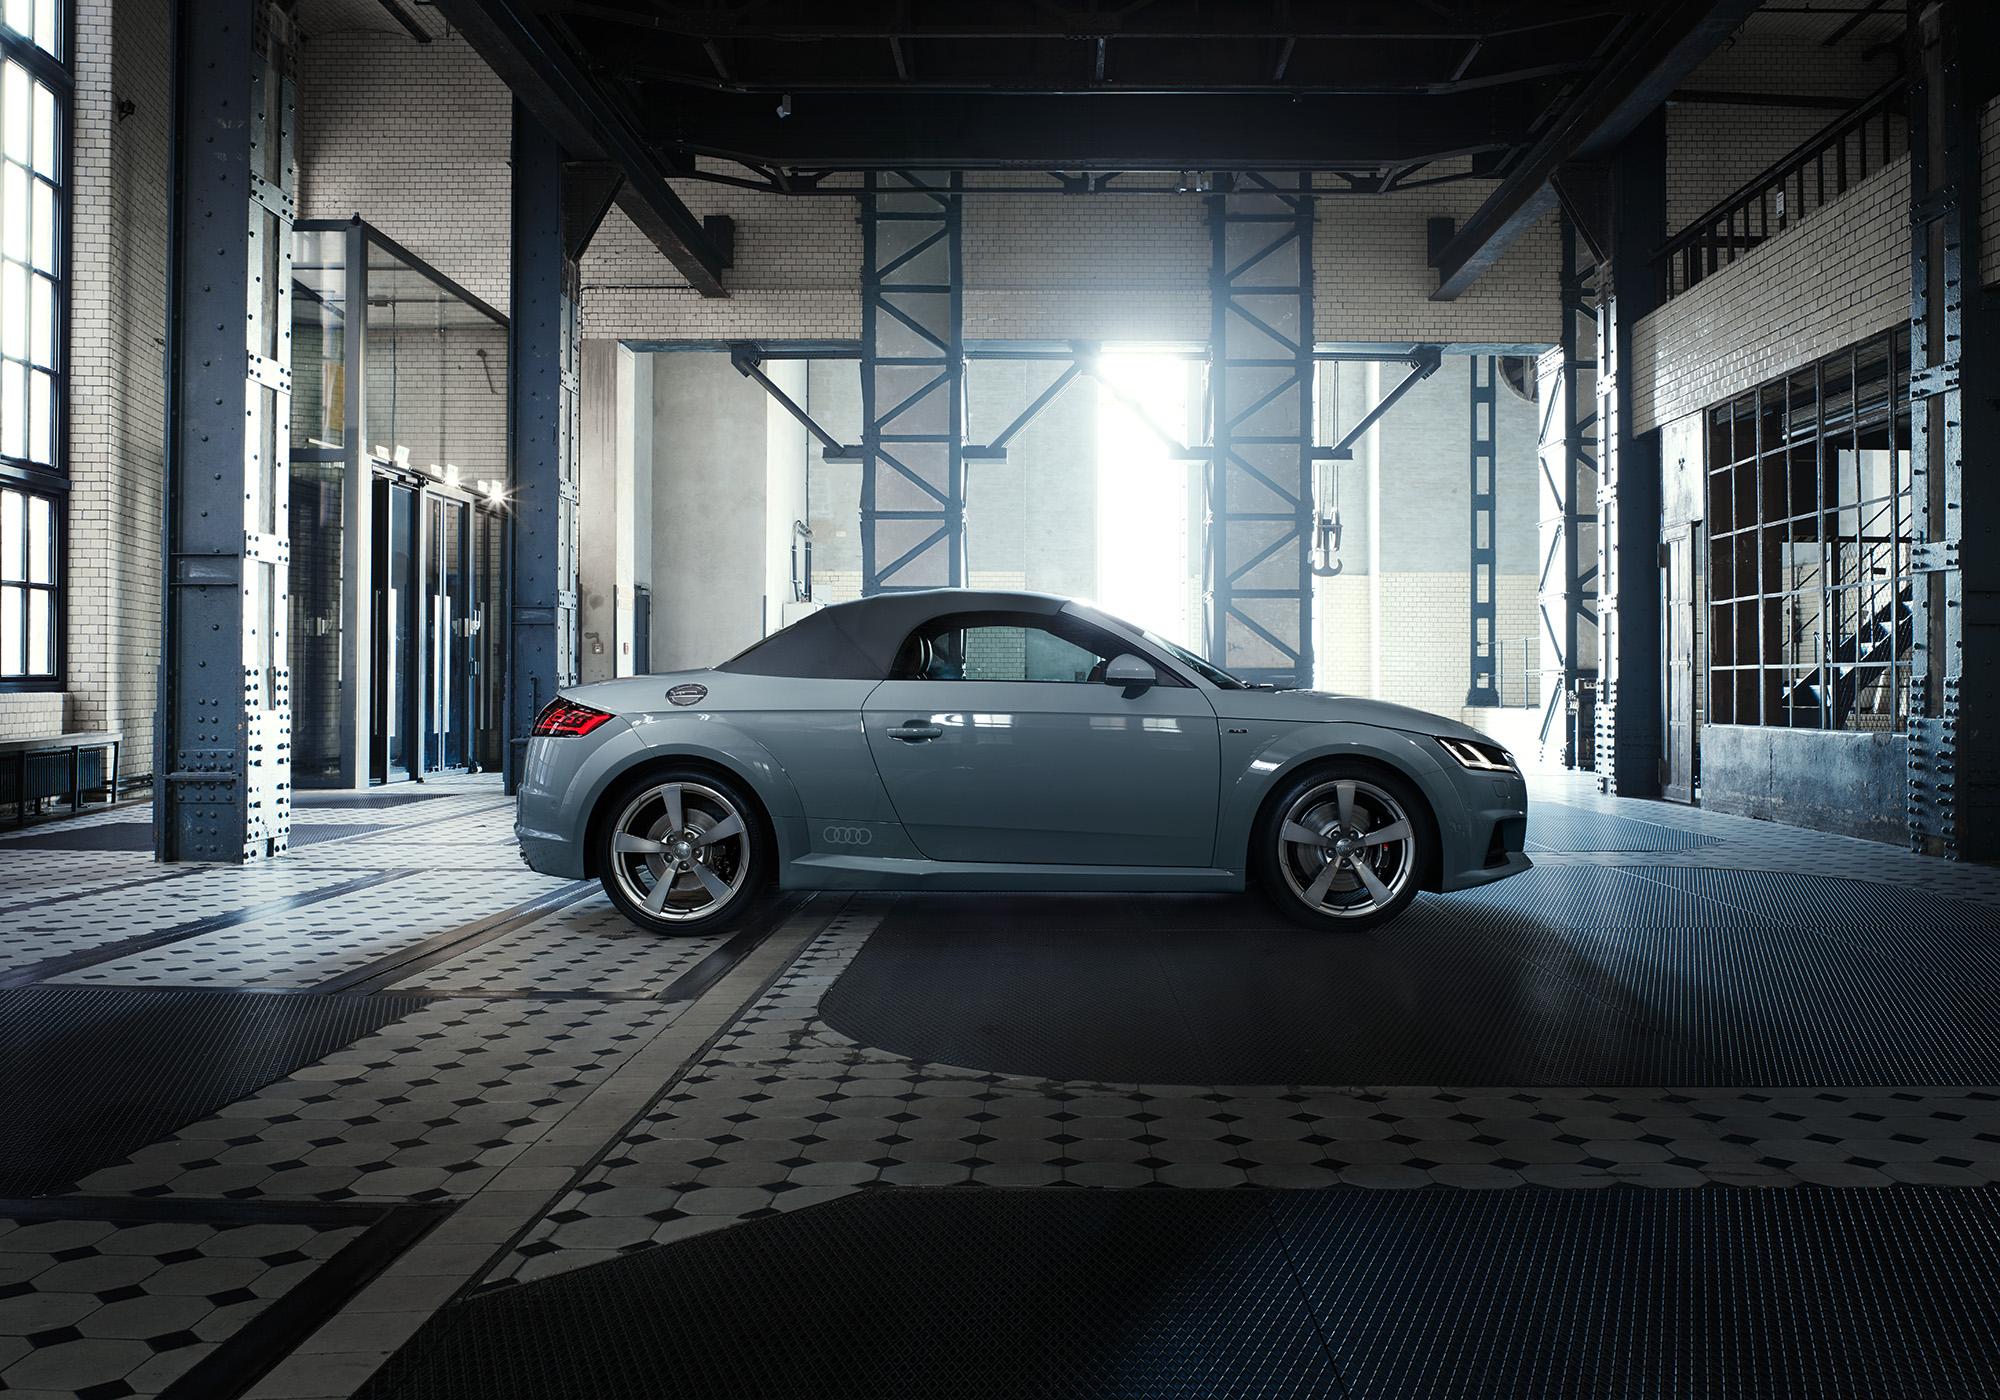 Client Audi | Photographer Jan Steinhilber | Agency Philipp und Keuntje